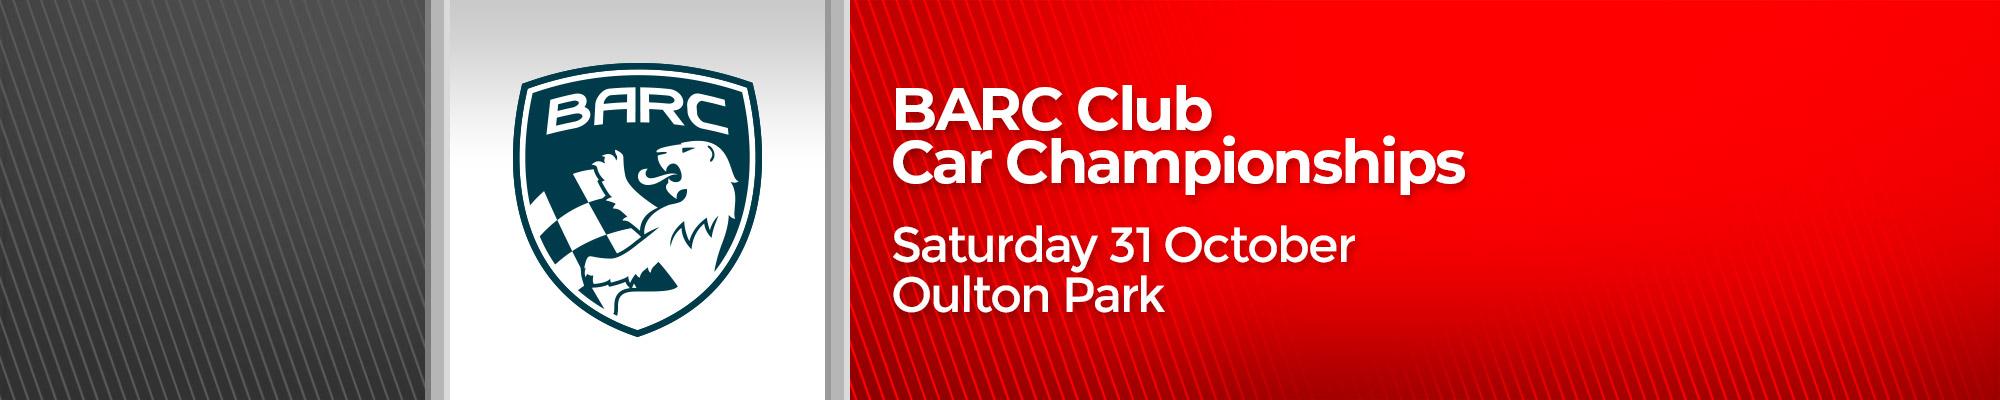 BARC Club Car Championships